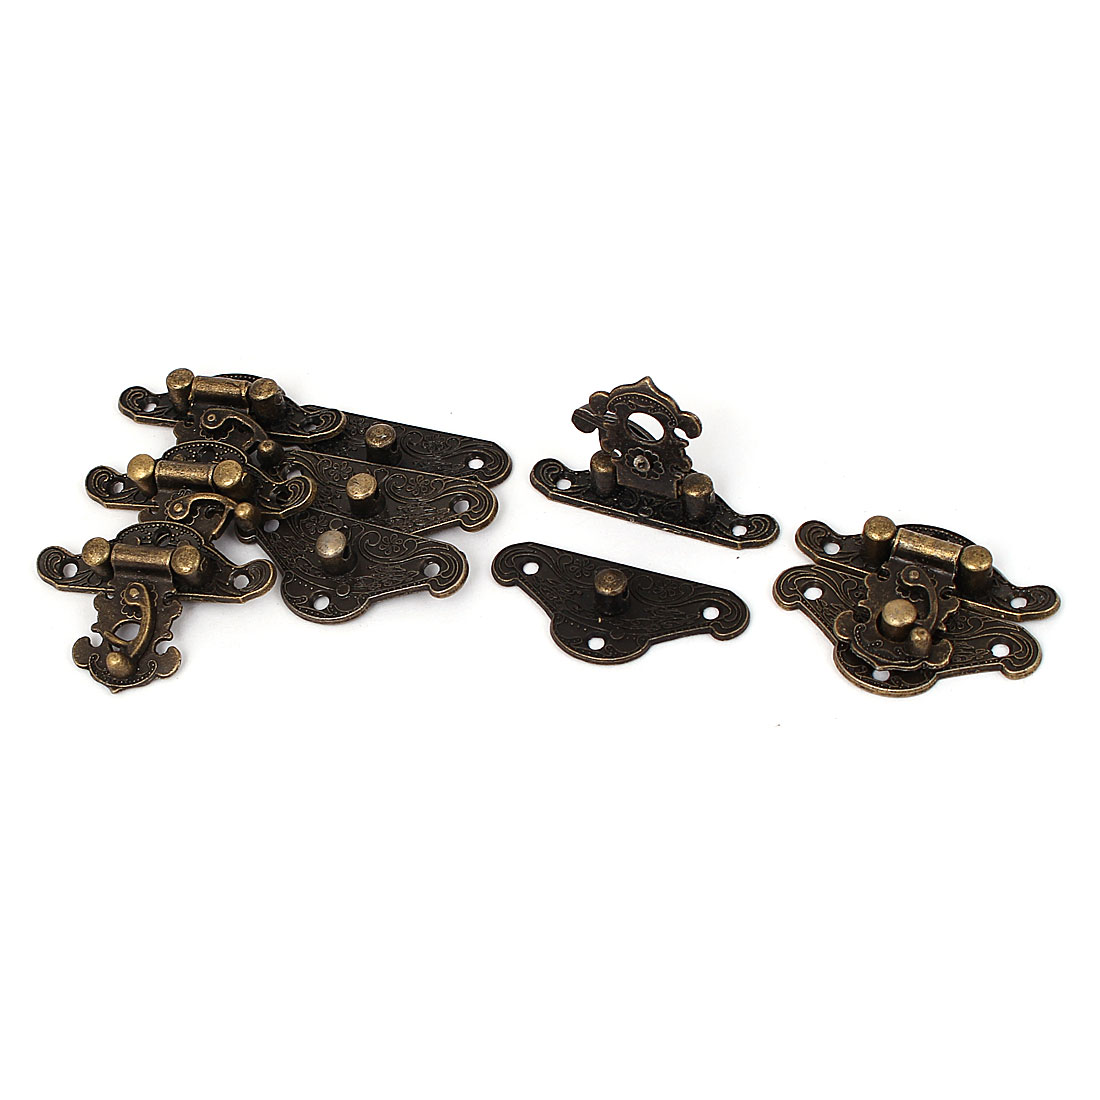 38mm x 29mm Vintage Style Wooden Box Case Hook Lock Lid Latch Bronze Tone 5pcs